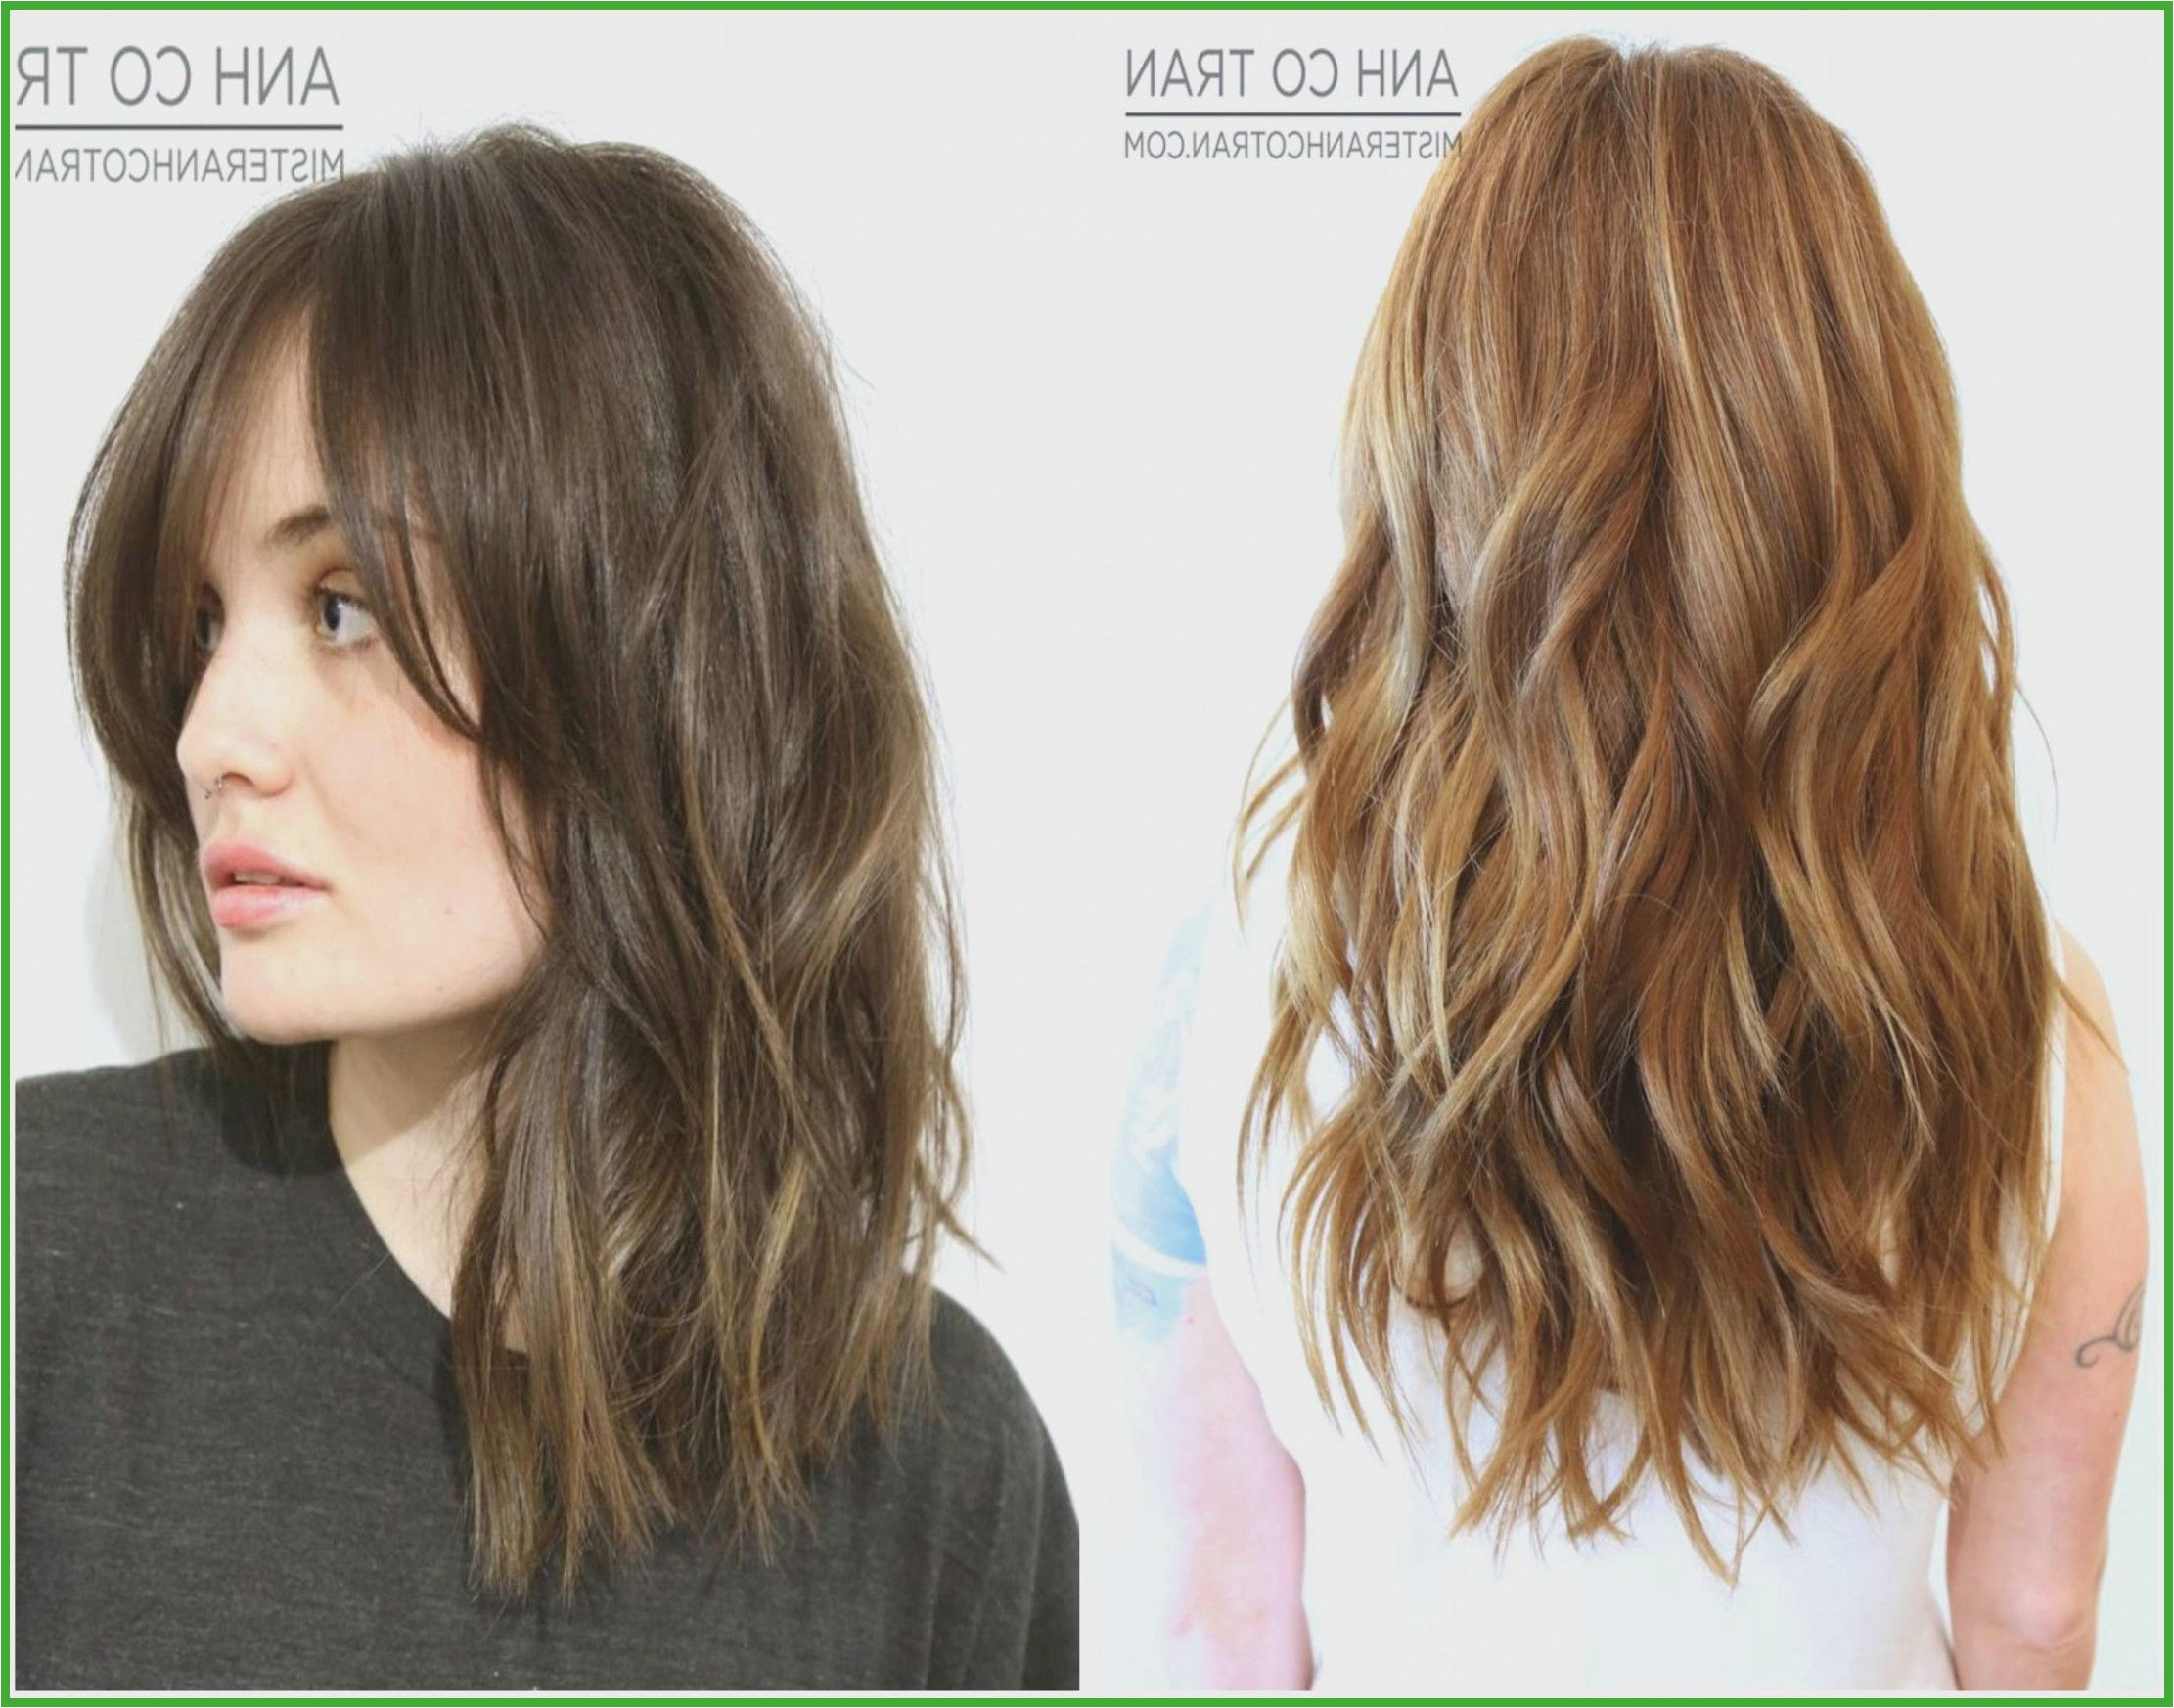 Medium Bob Hairstyles for Curly Hair 8563 Medium Curled Hair Very Curly Hairstyles Fresh Curly Hair 0d